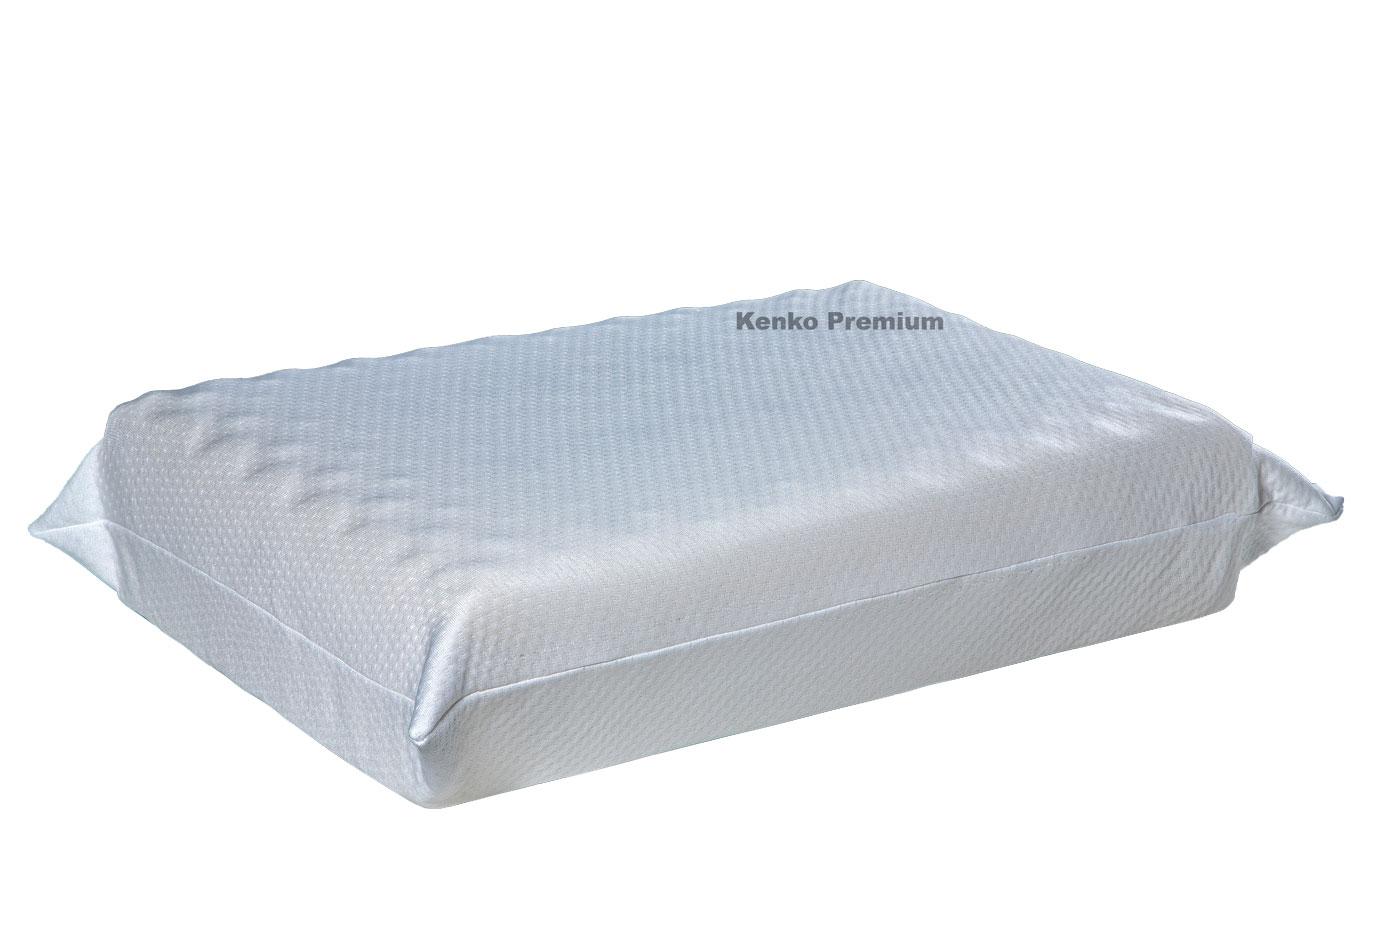 Travesseiro Magnético Kenko Premium Anatômico Camadas Ajustáveis Hr Látex One Face  - Kenko Premium Colchões